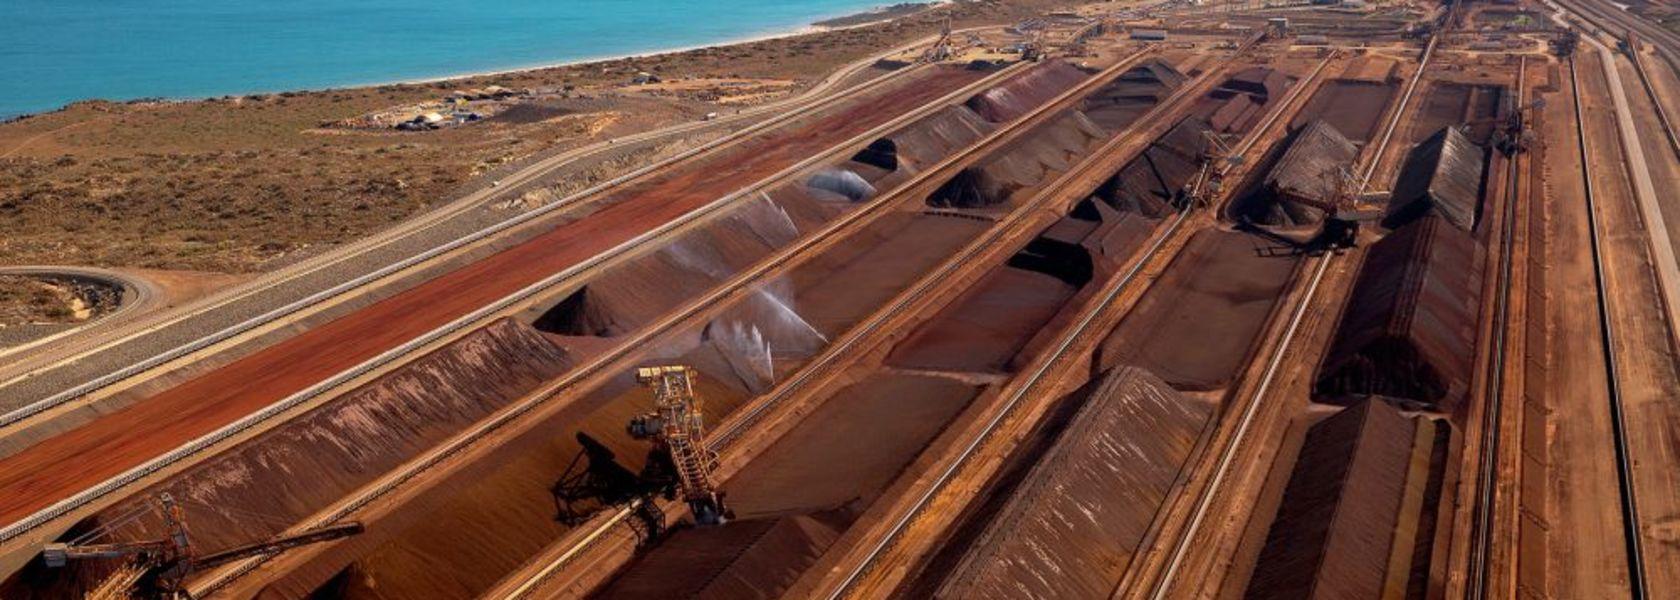 Rio Tinto shares climb to decade high - Mining Journal